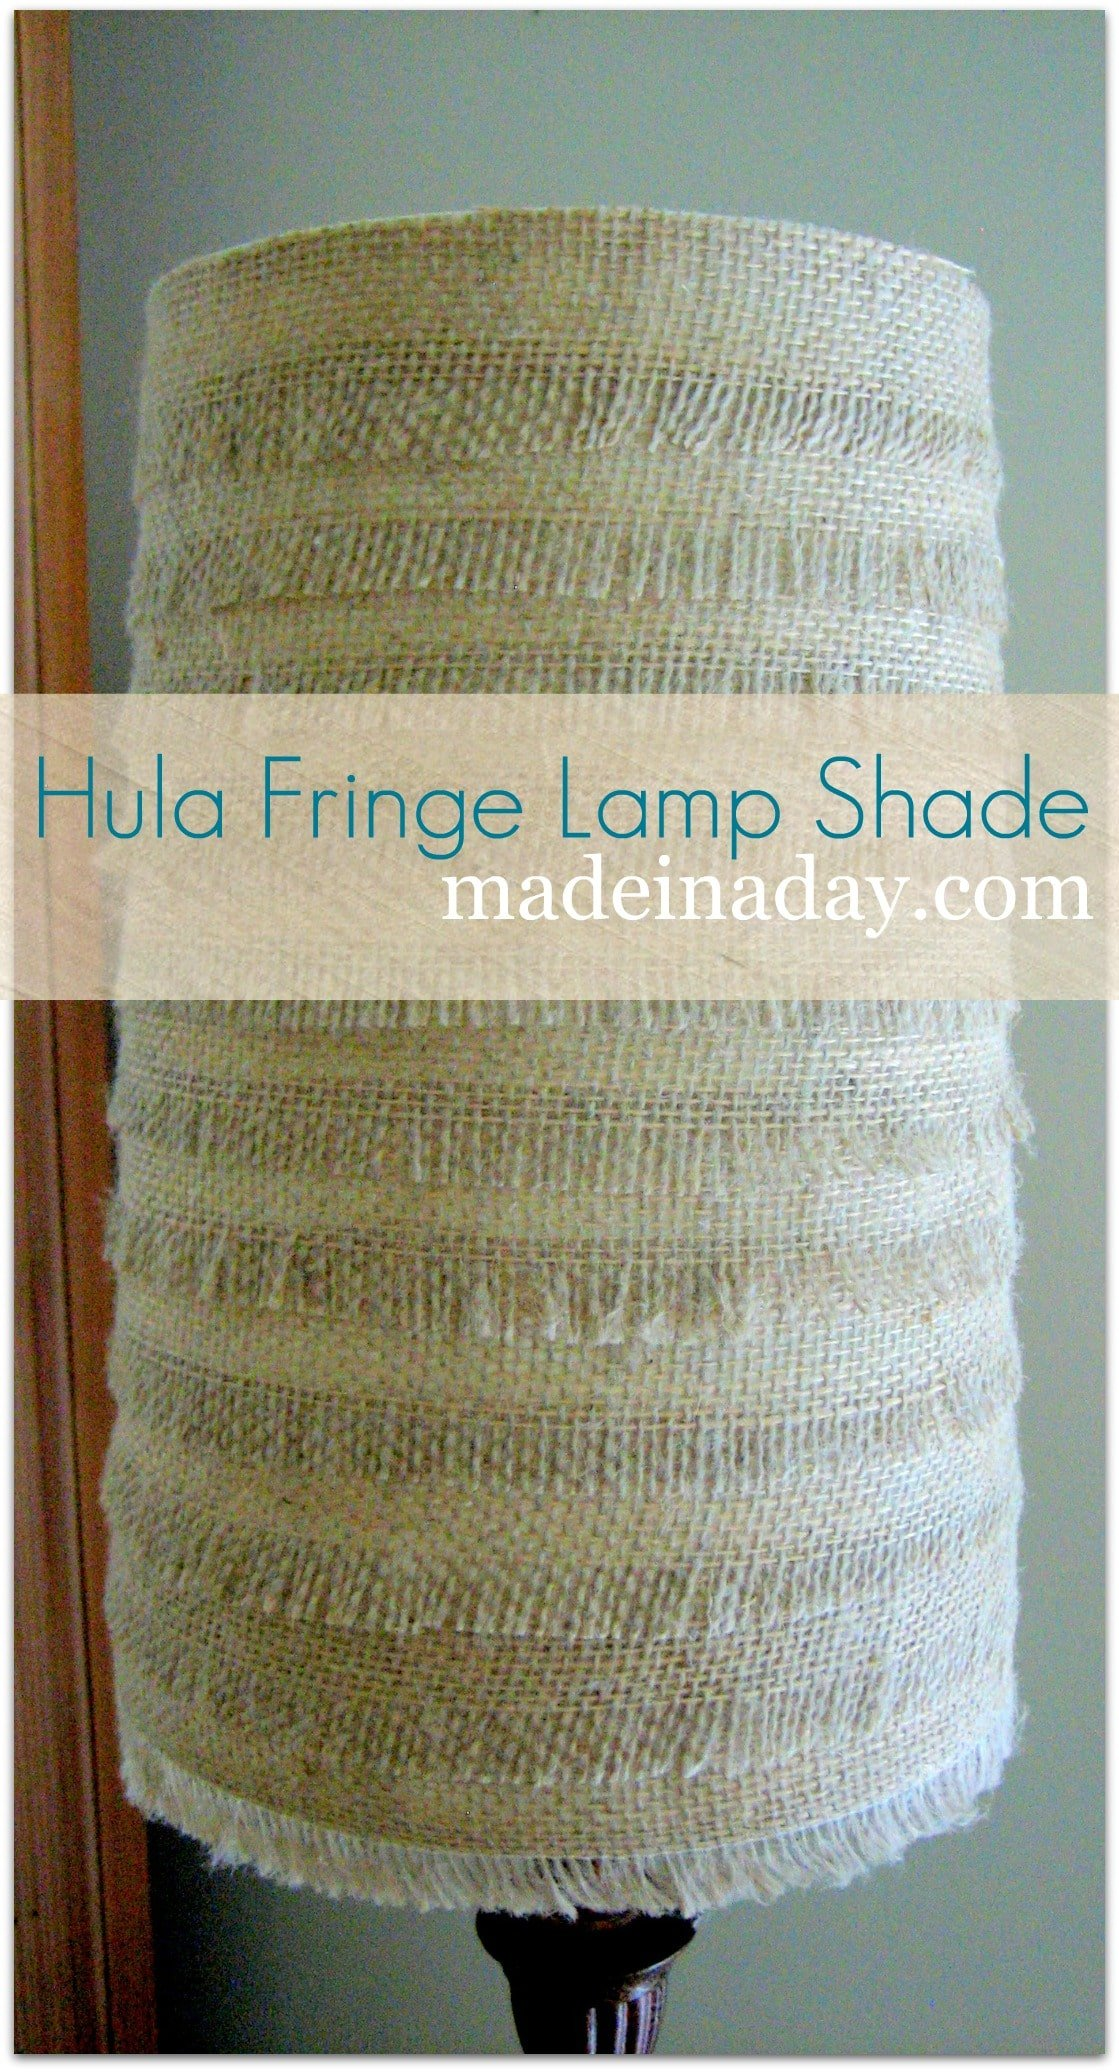 Burlap Lamp Shade Hula Fringe